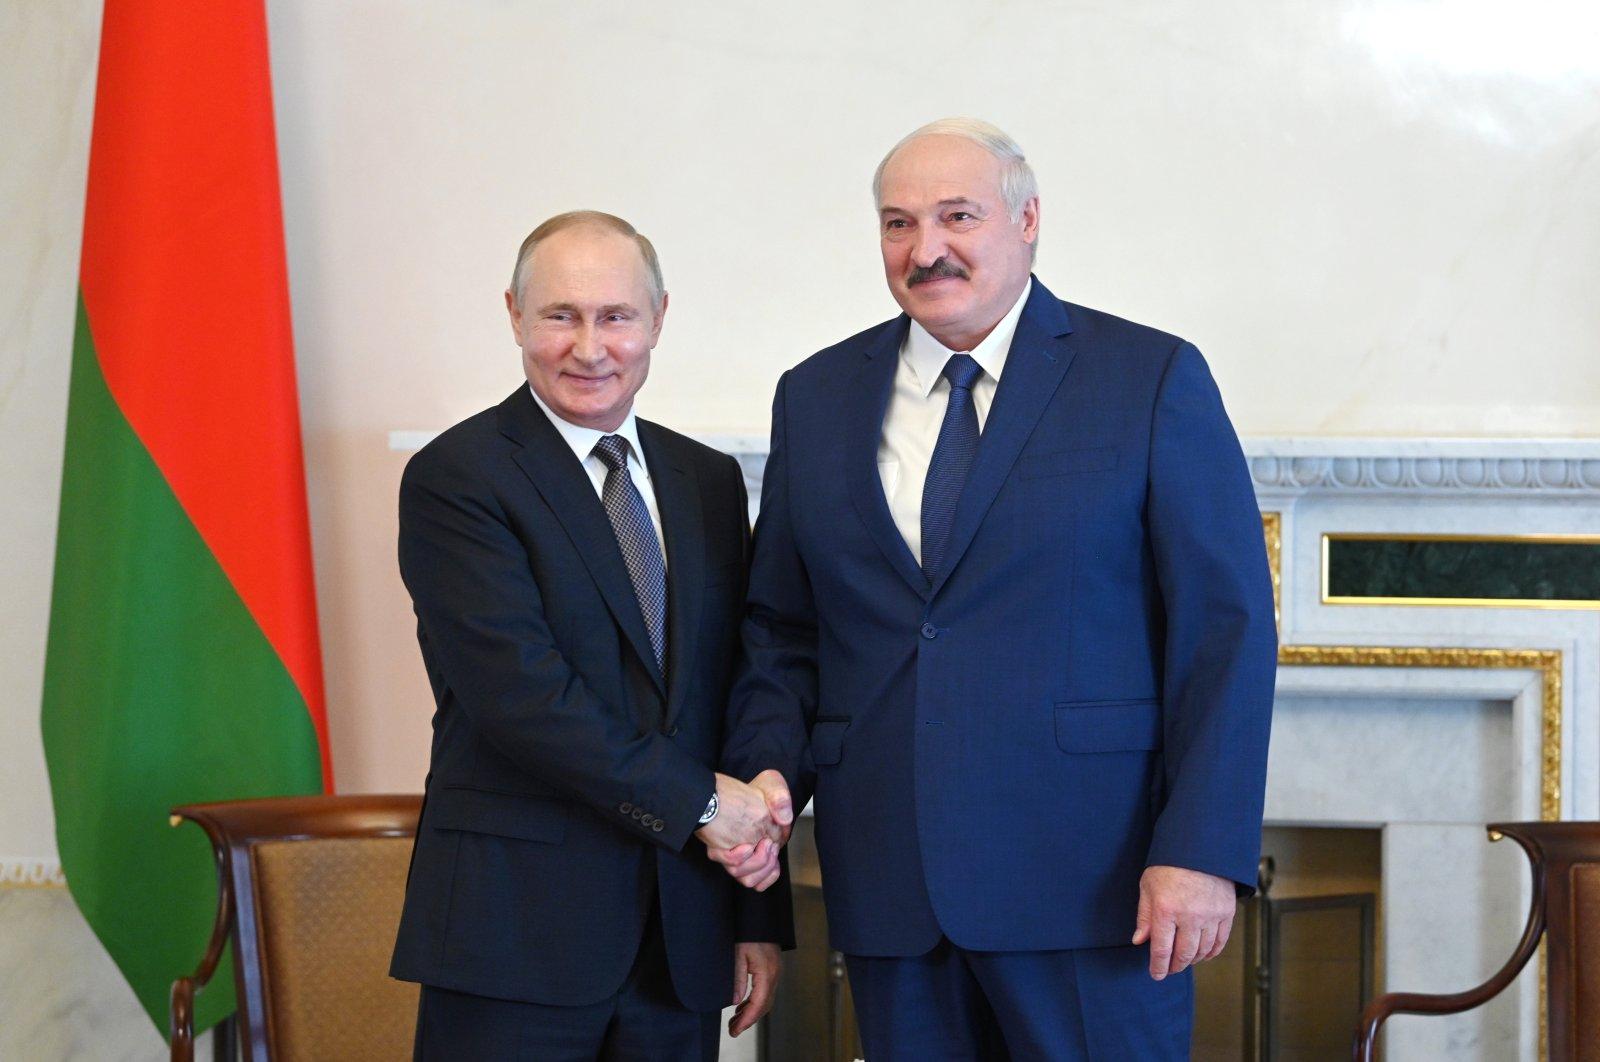 Russian President Vladimir Putin (L) shakes hands with Belarusian President Alexander Lukashenko during a meeting in St. Petersburg, Russia, July 13, 2021. (Kremlin via Reuters)